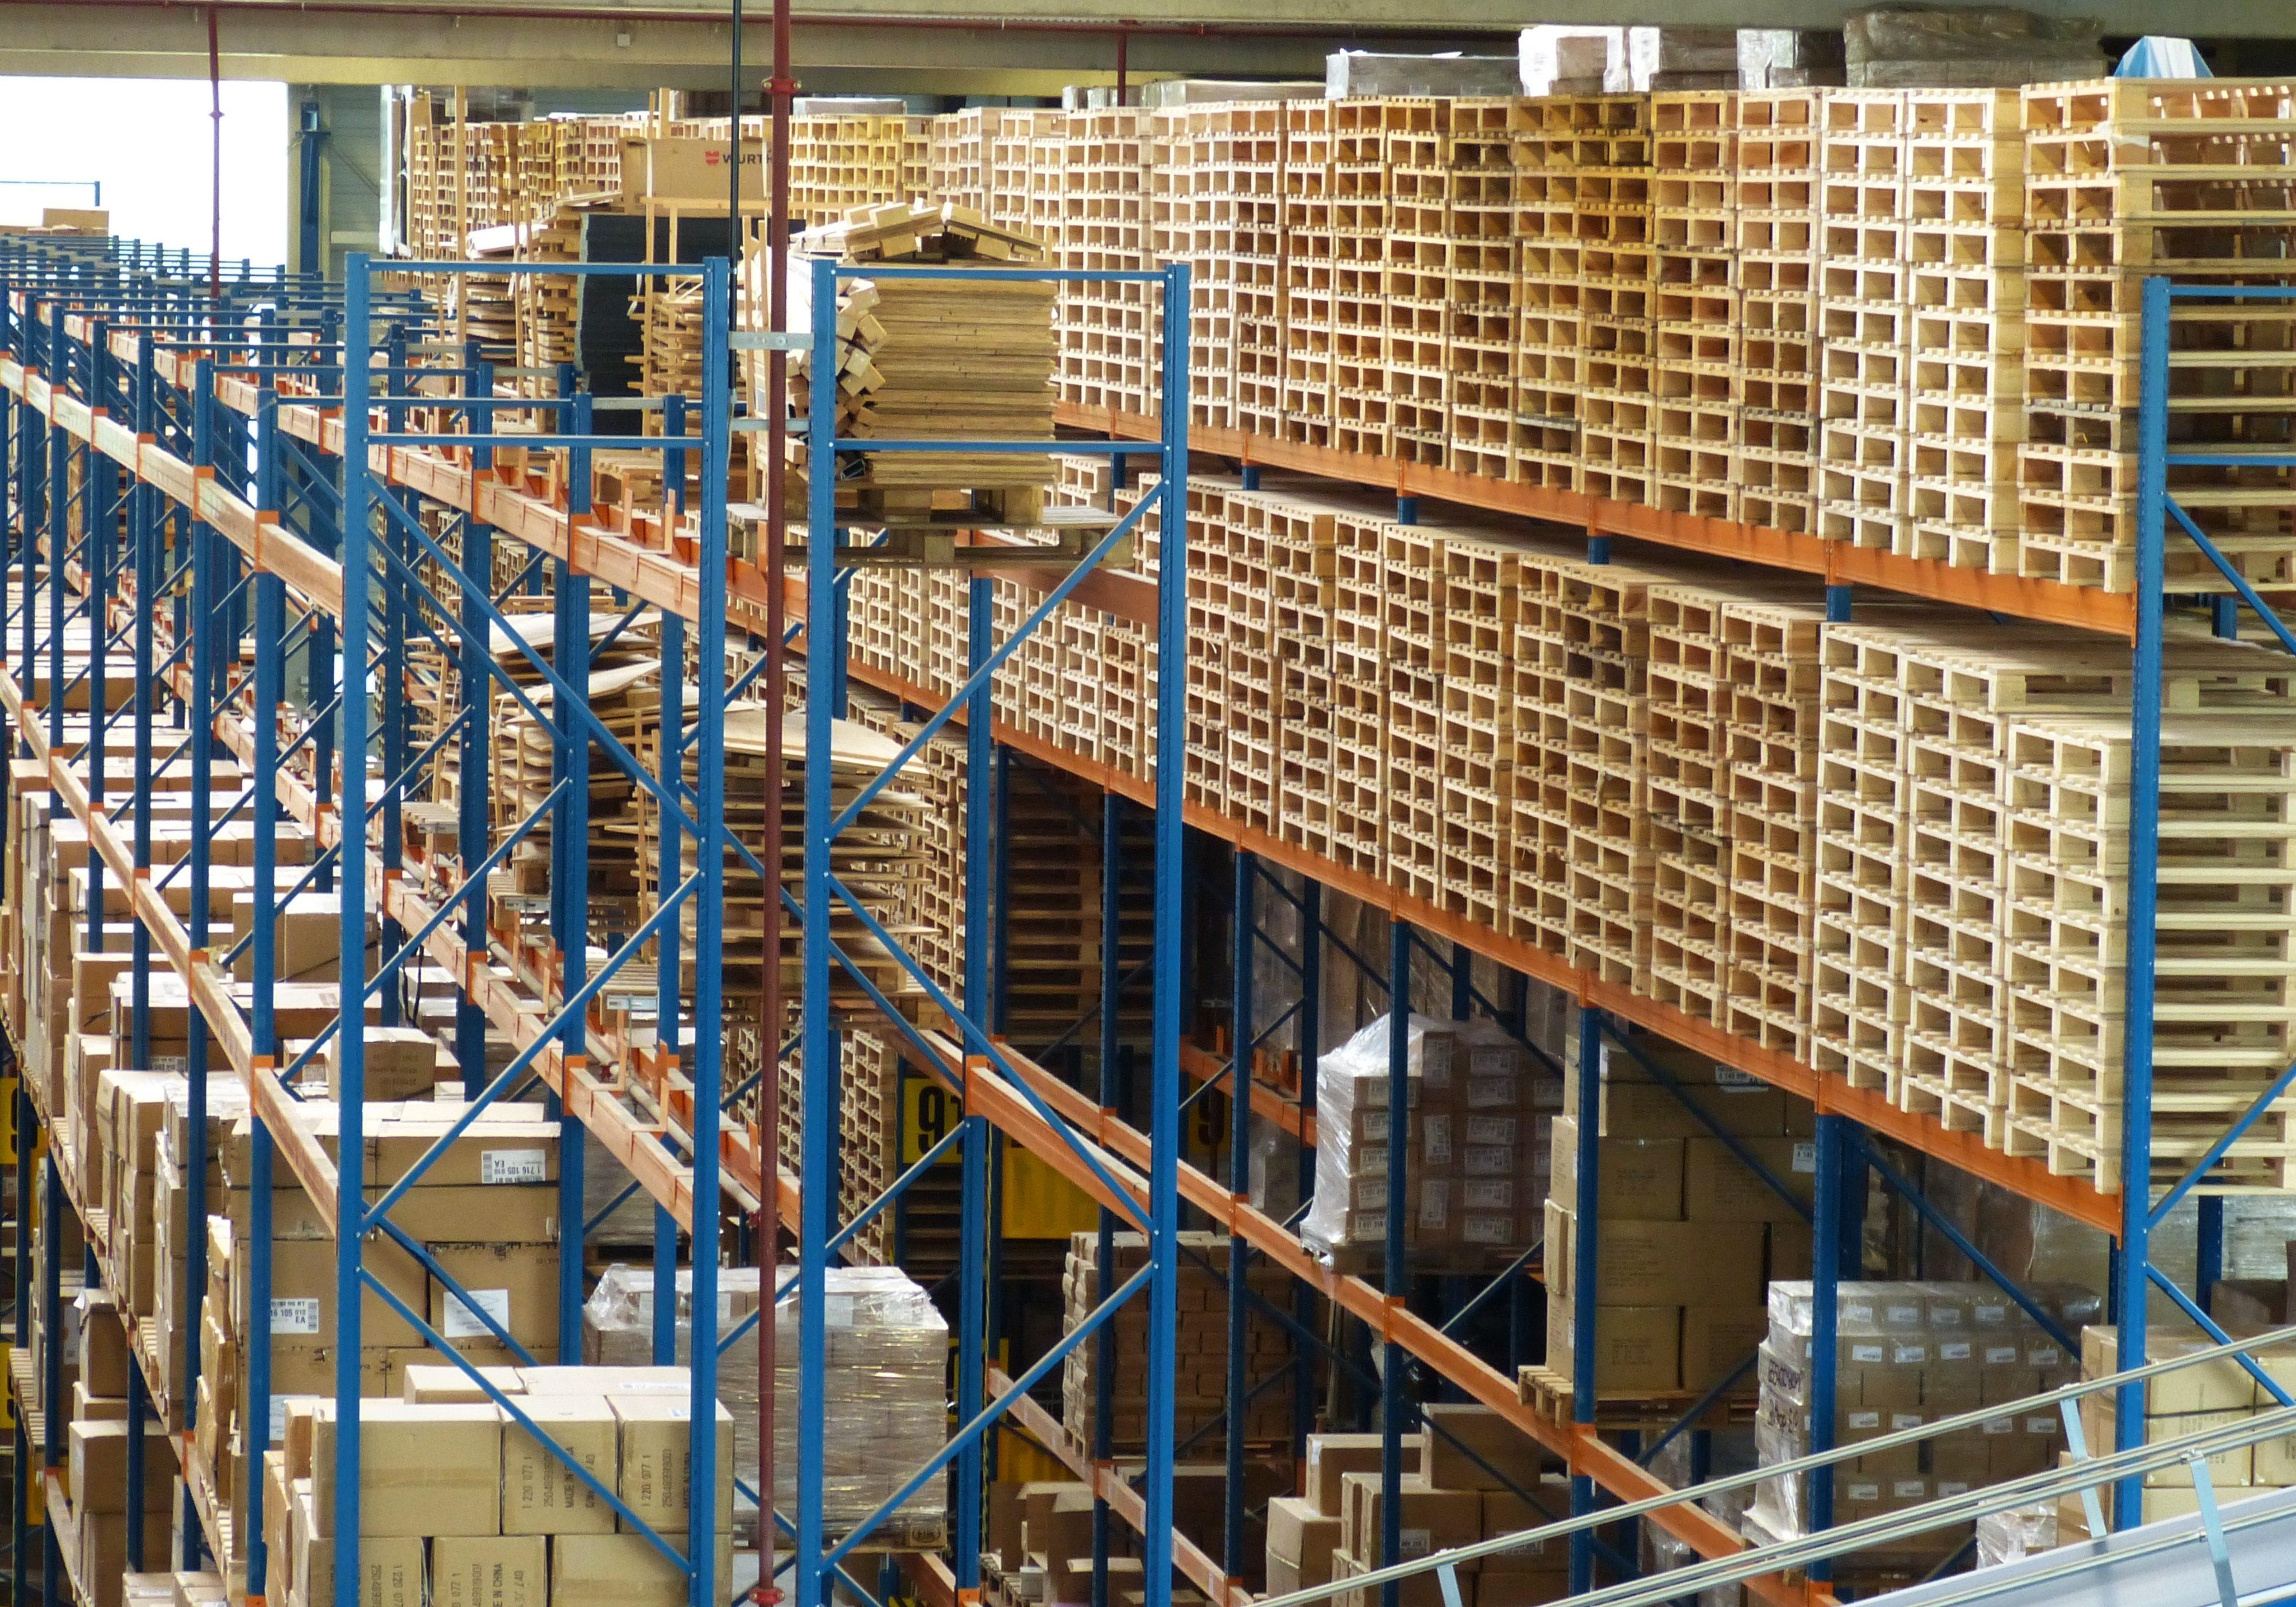 3PL Logistics Warehouse 852937